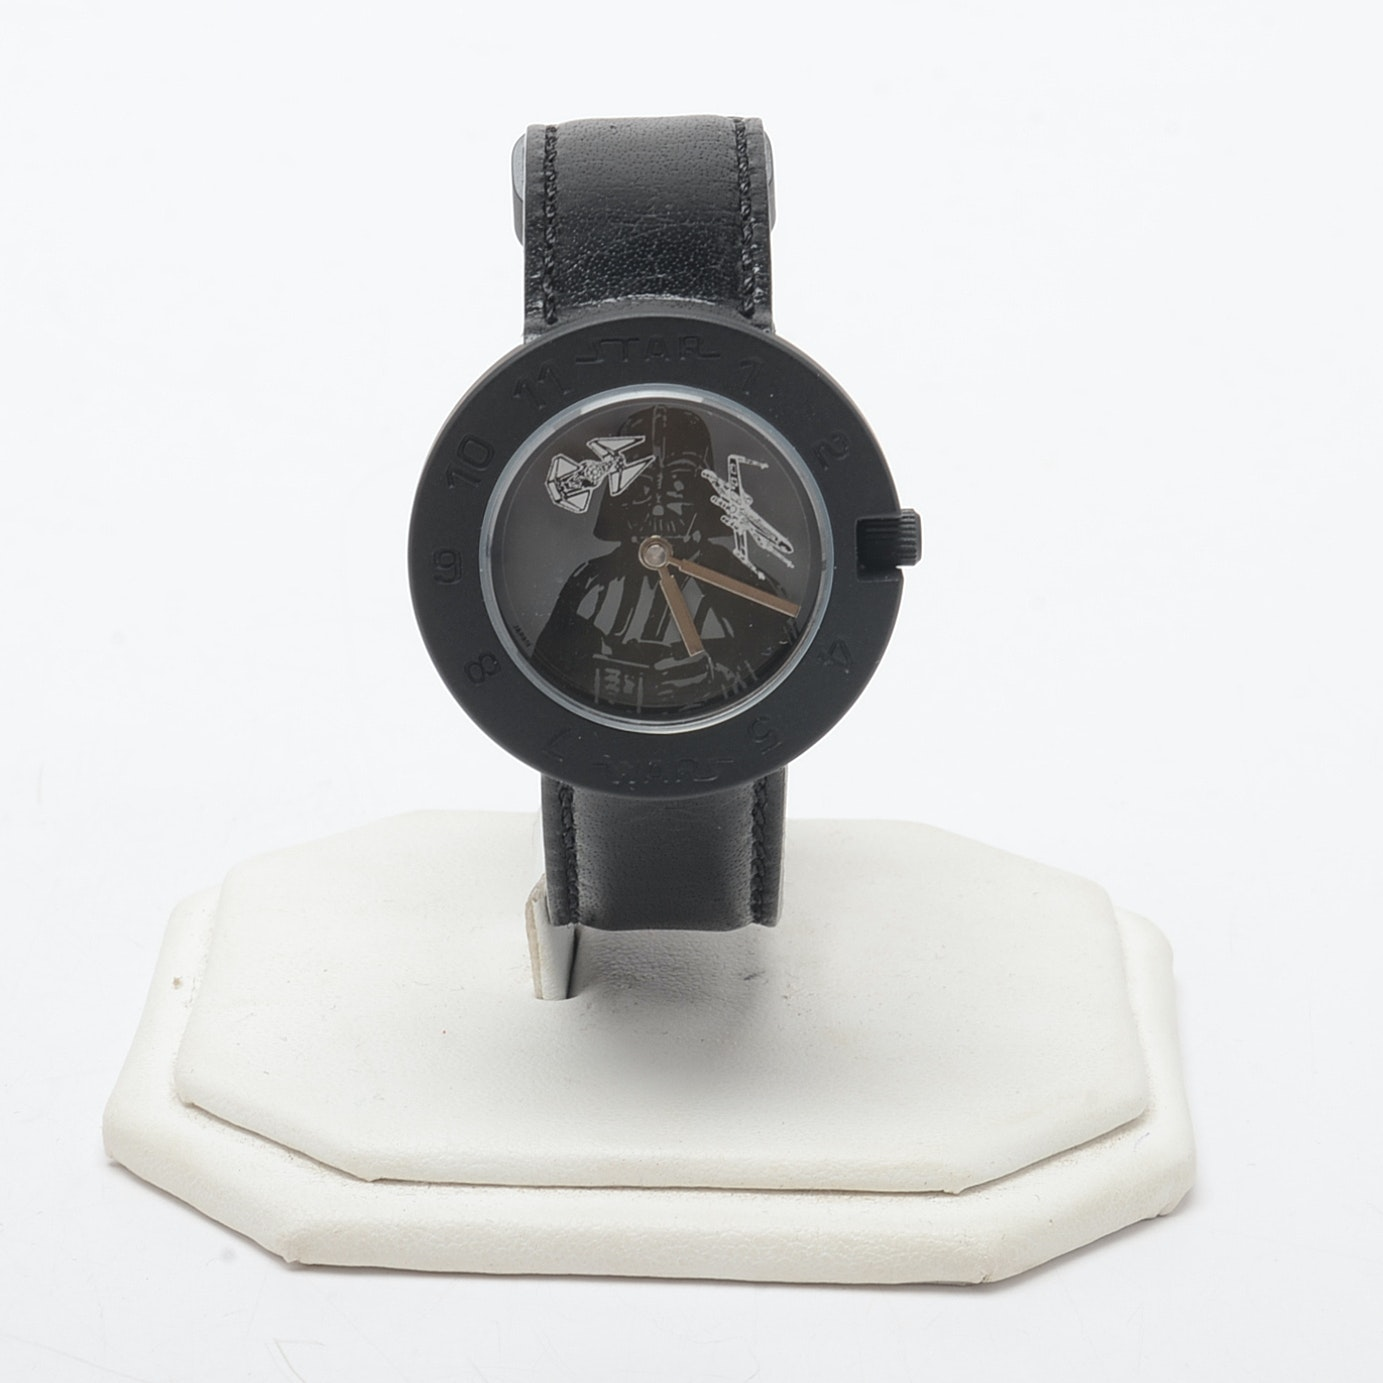 Limited Edition FX '93 Convention Darth Vader Wristwatch